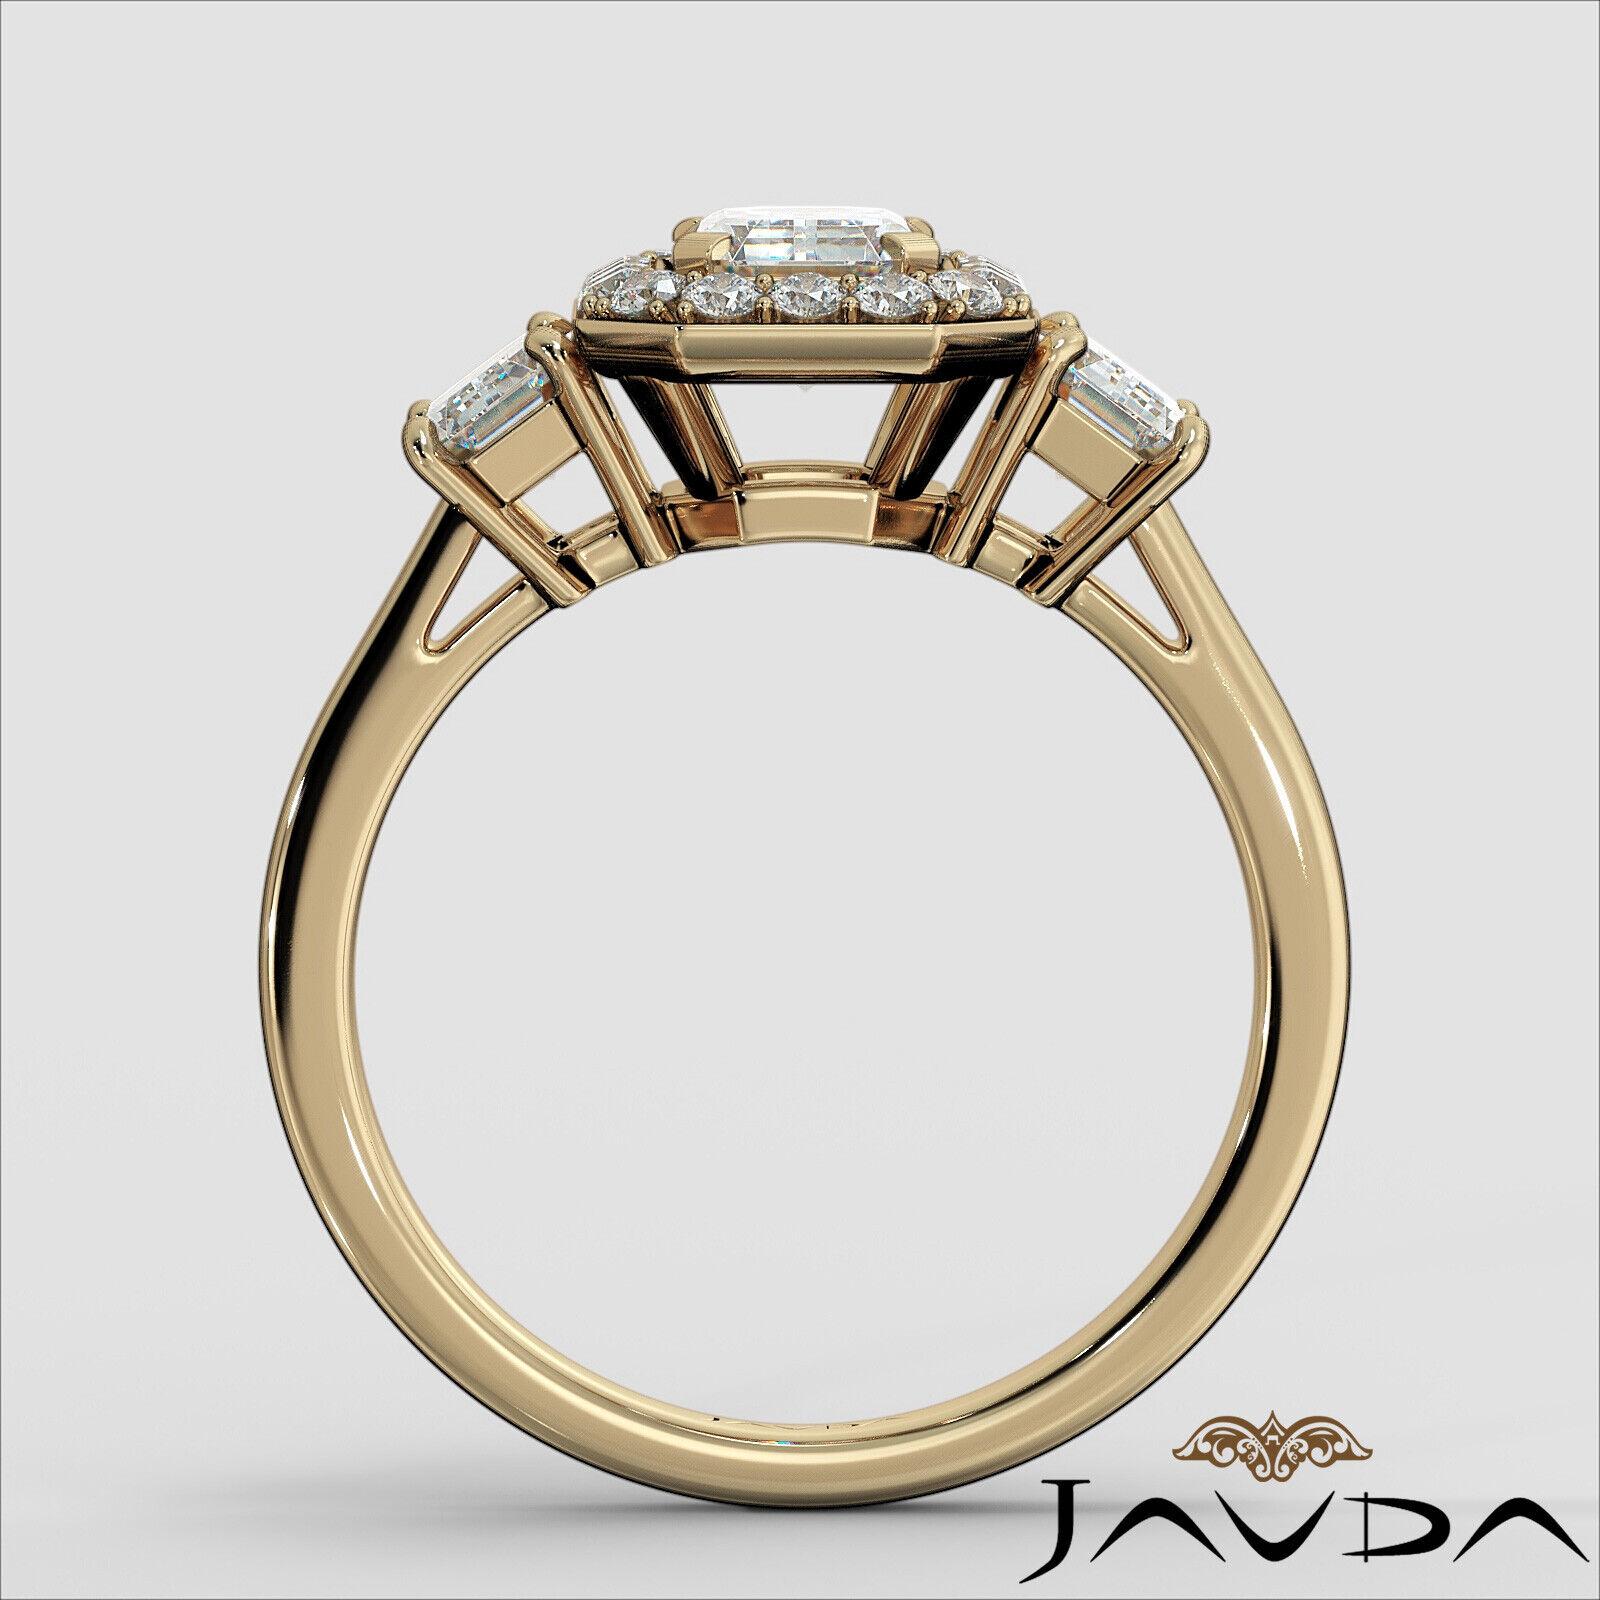 1.55ctw 3 Stone Halo Pave Emerald Diamond Engagement Ring GIA F-SI2 White Gold 11